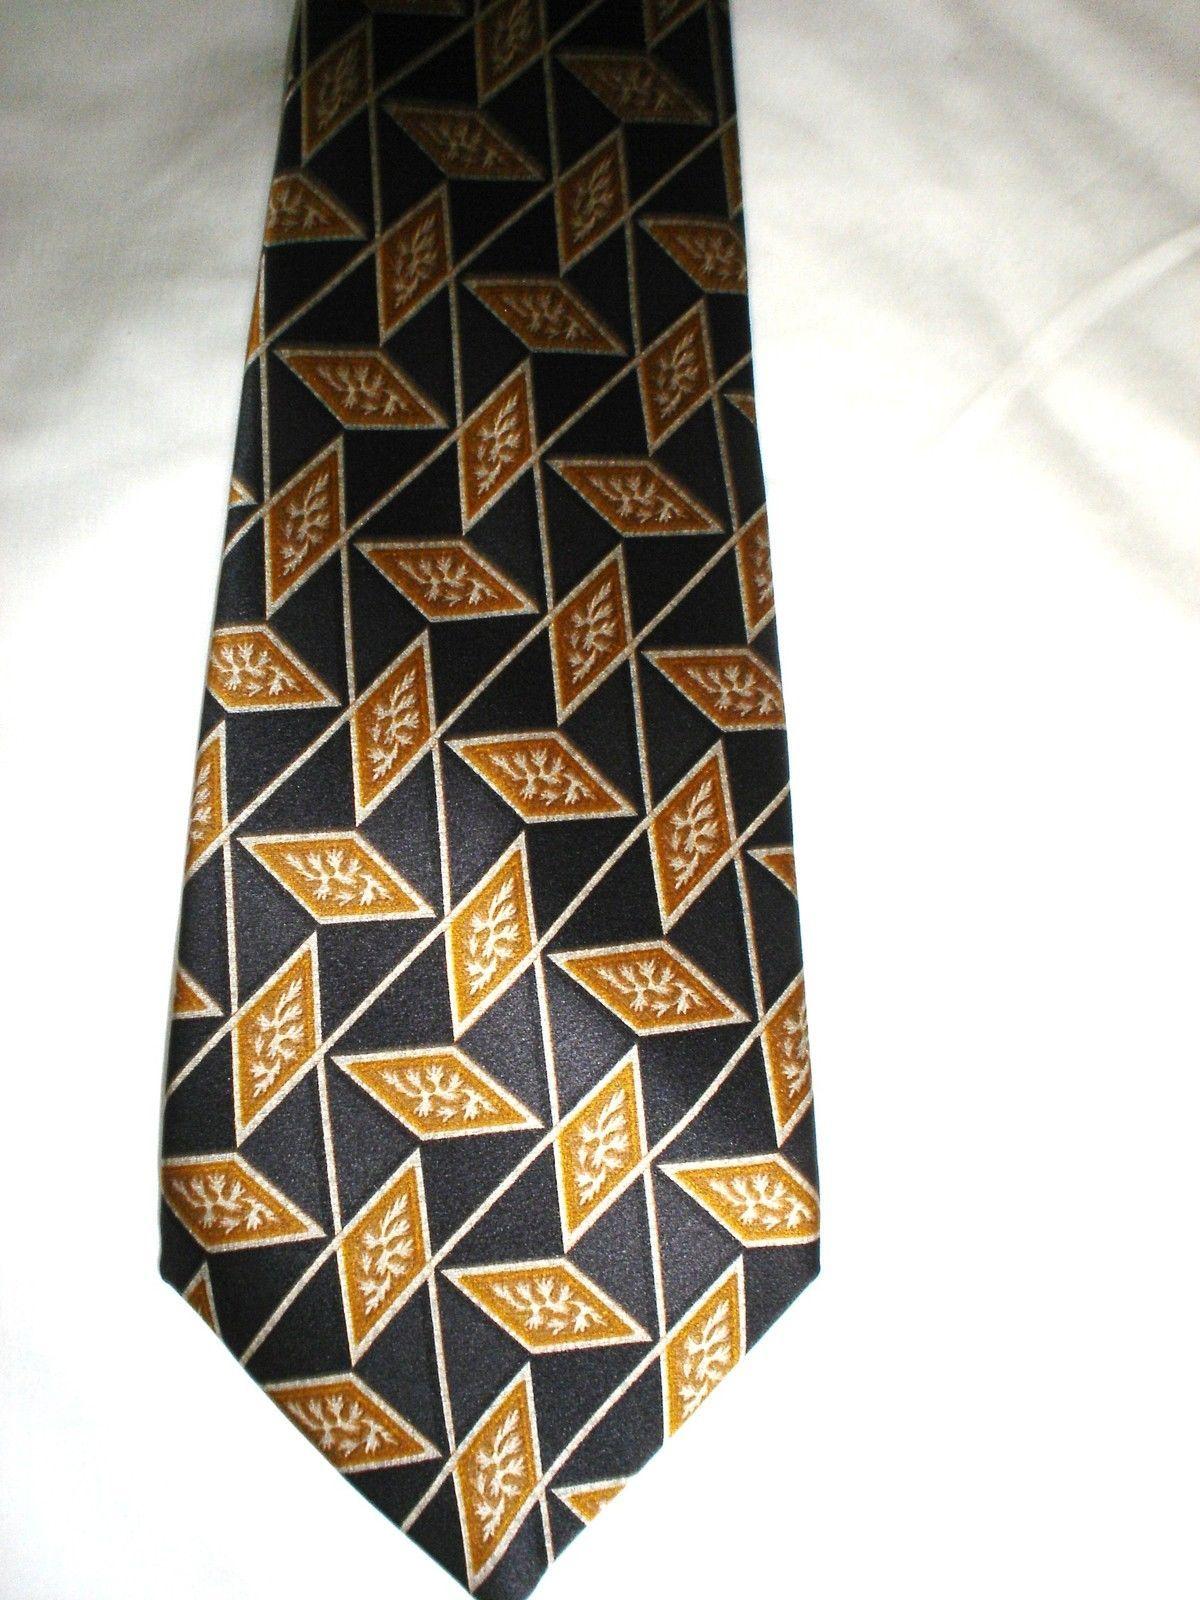 Lanvin Silk Tie---Made in France - $69.99